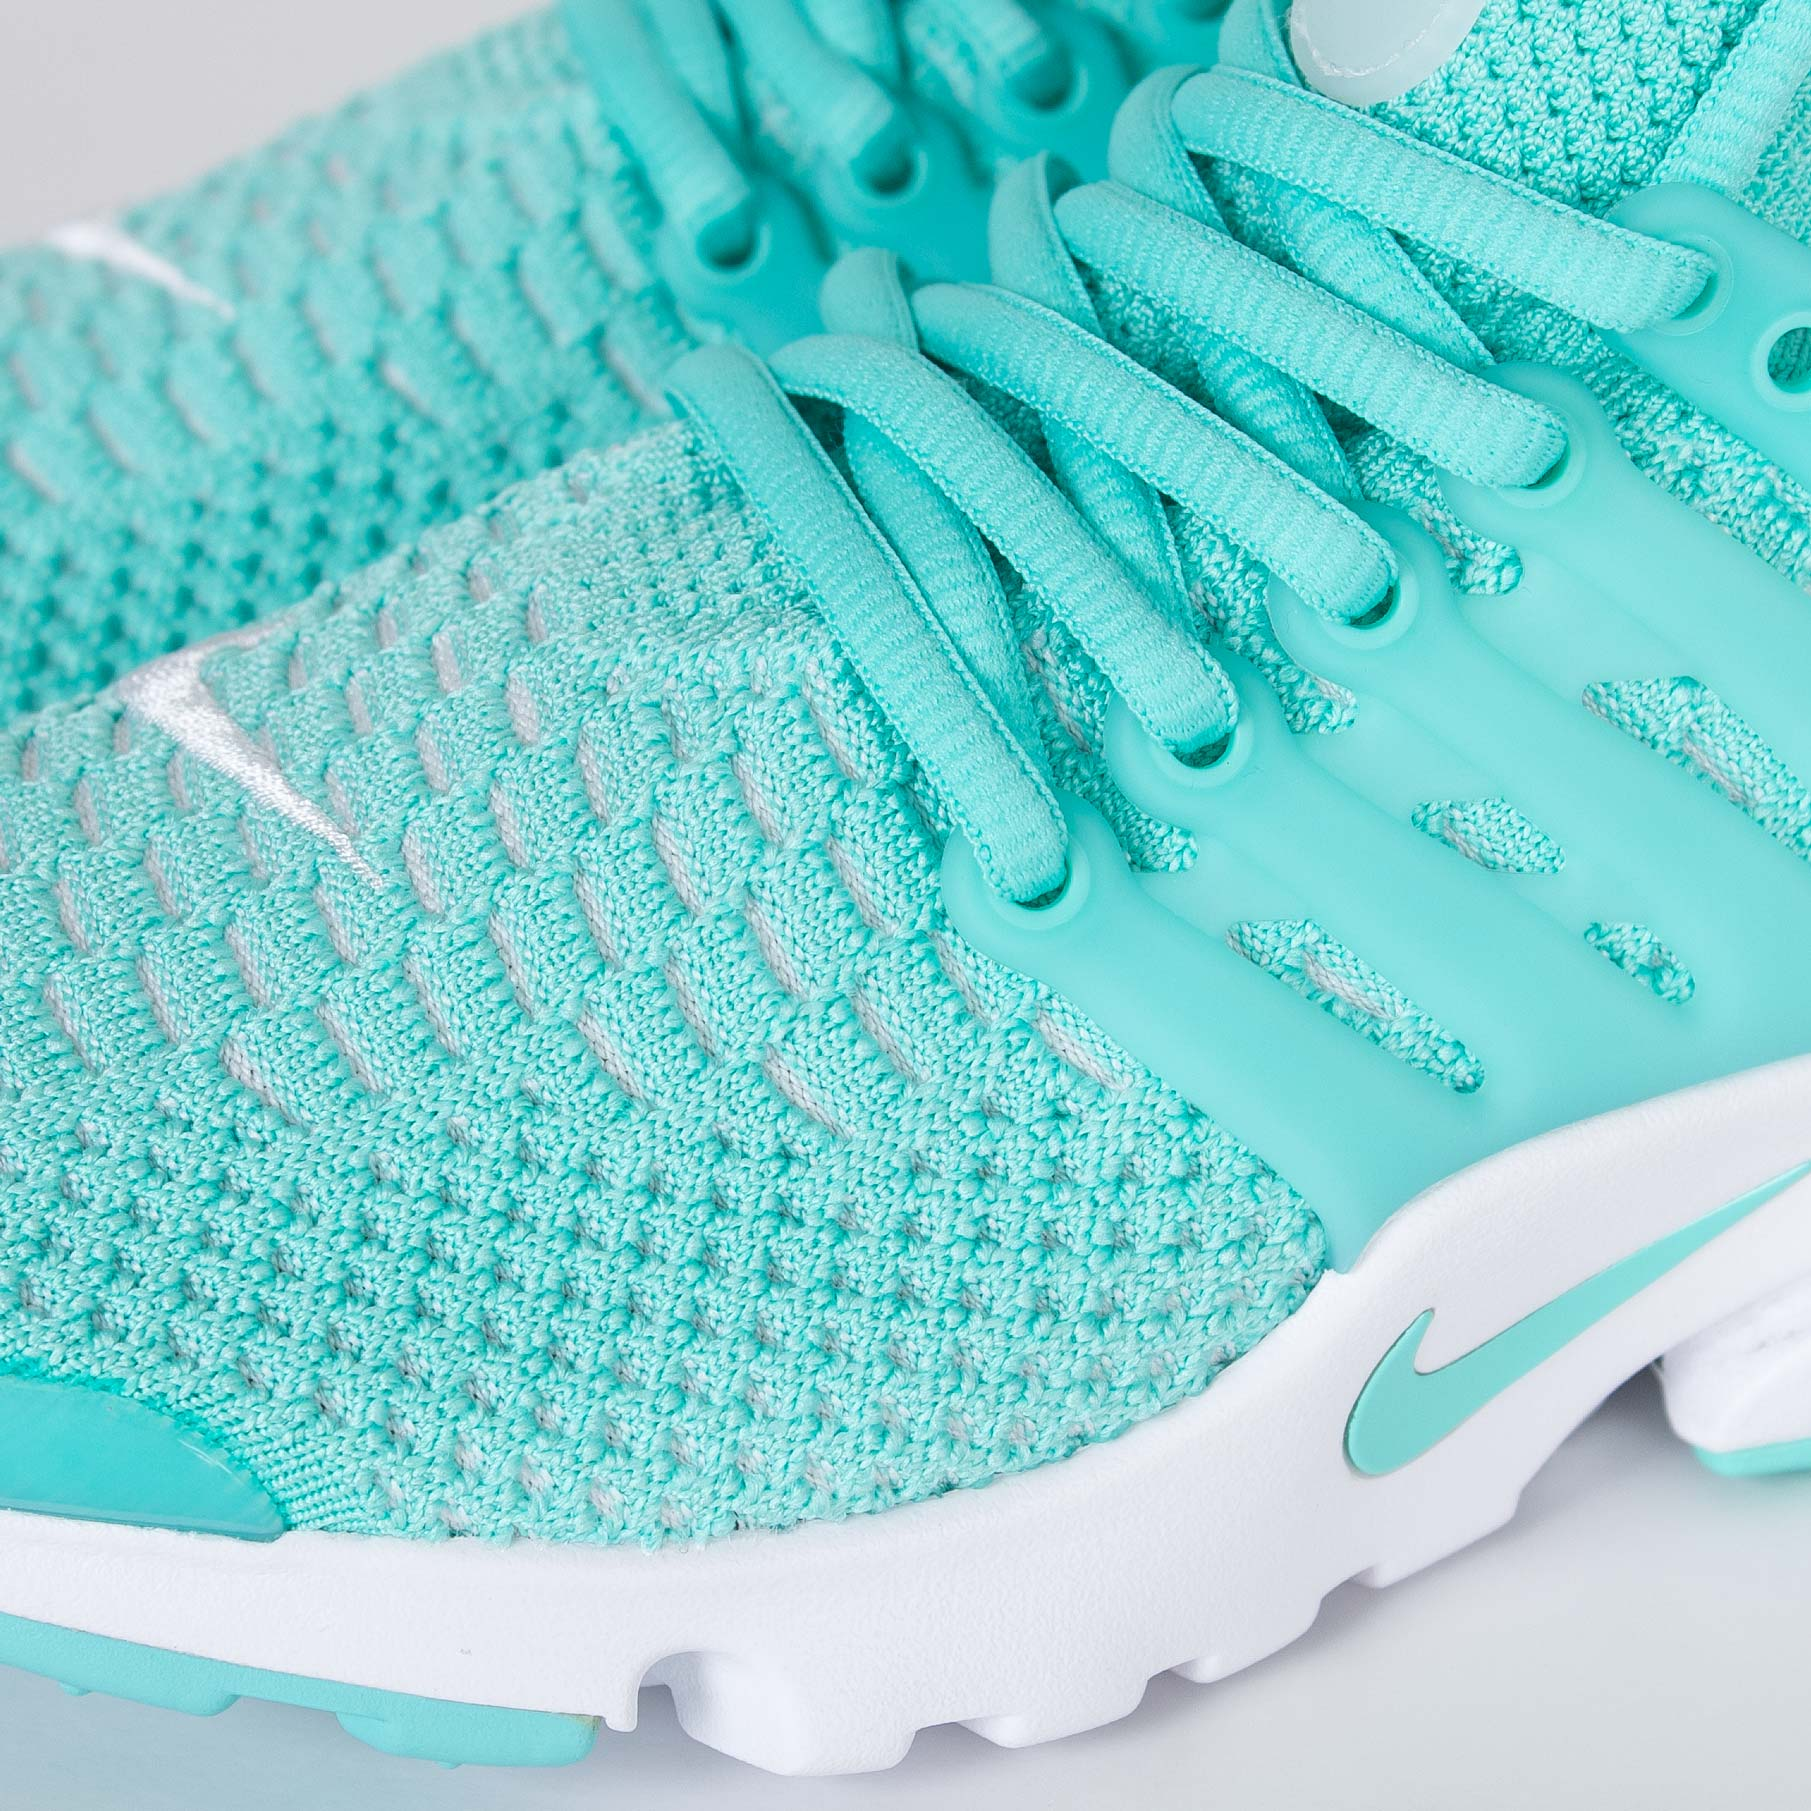 d5726adbf7 Nike Wmns Air Presto Flyknit Ultra - 835738-301 - Sneakersnstuff ...